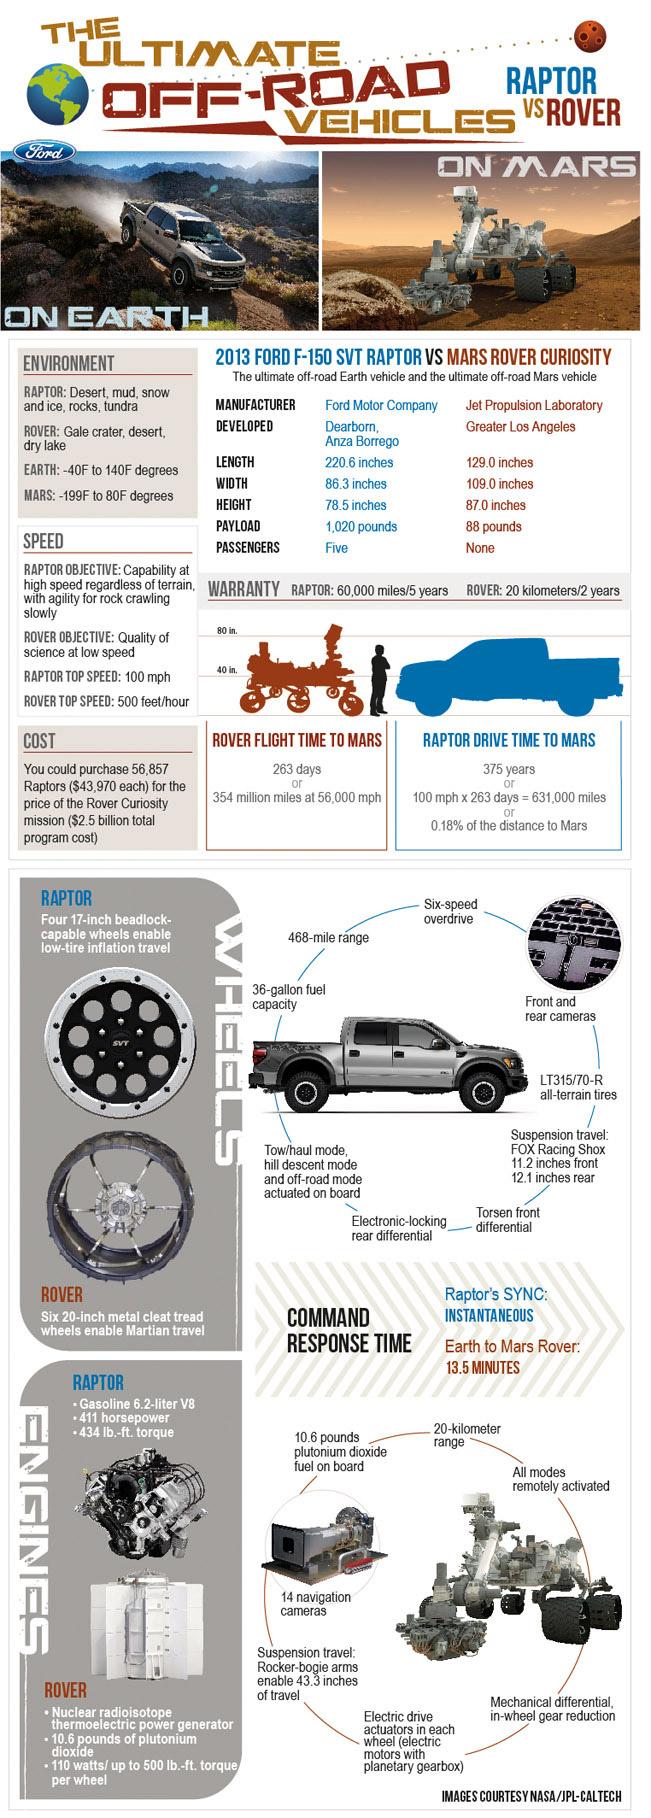 Ford F150 Raptop vs. Rover